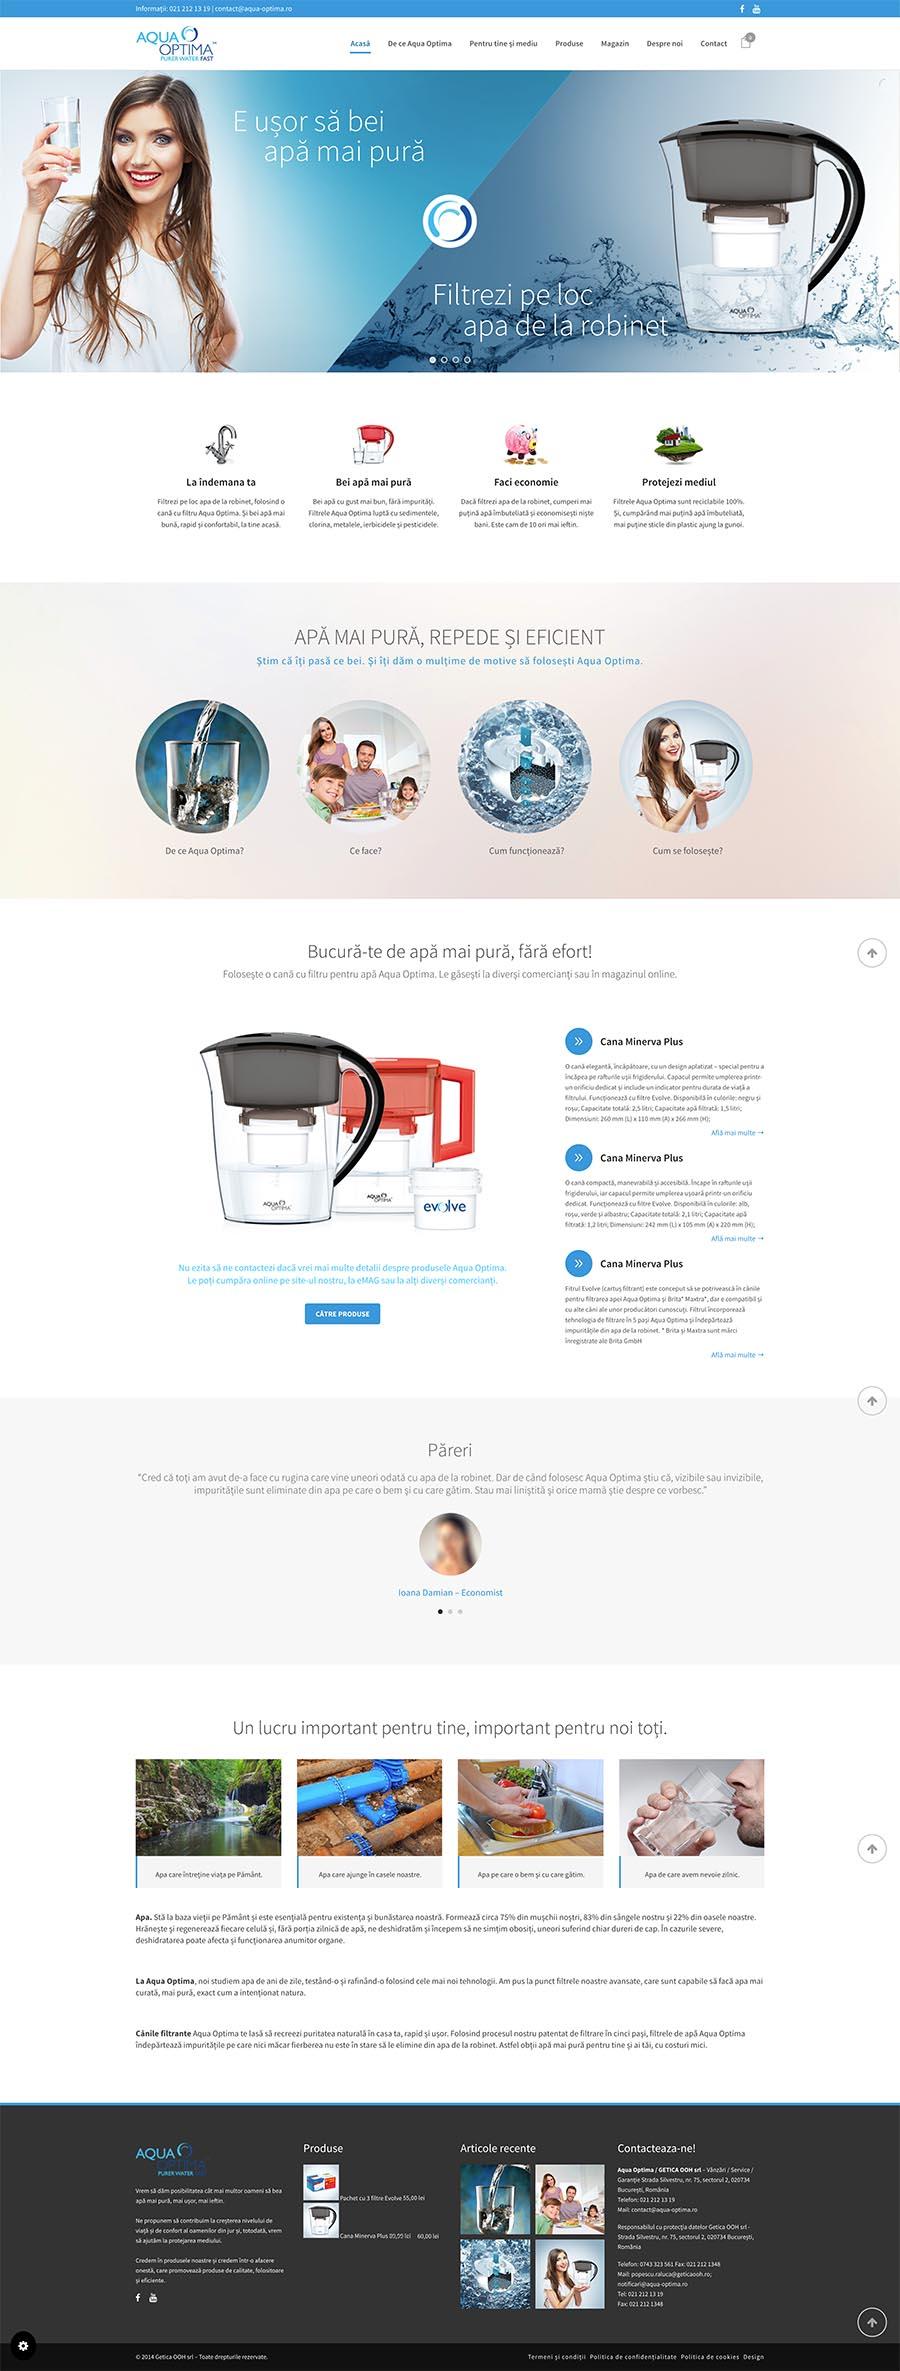 Aqua Optima Home Page